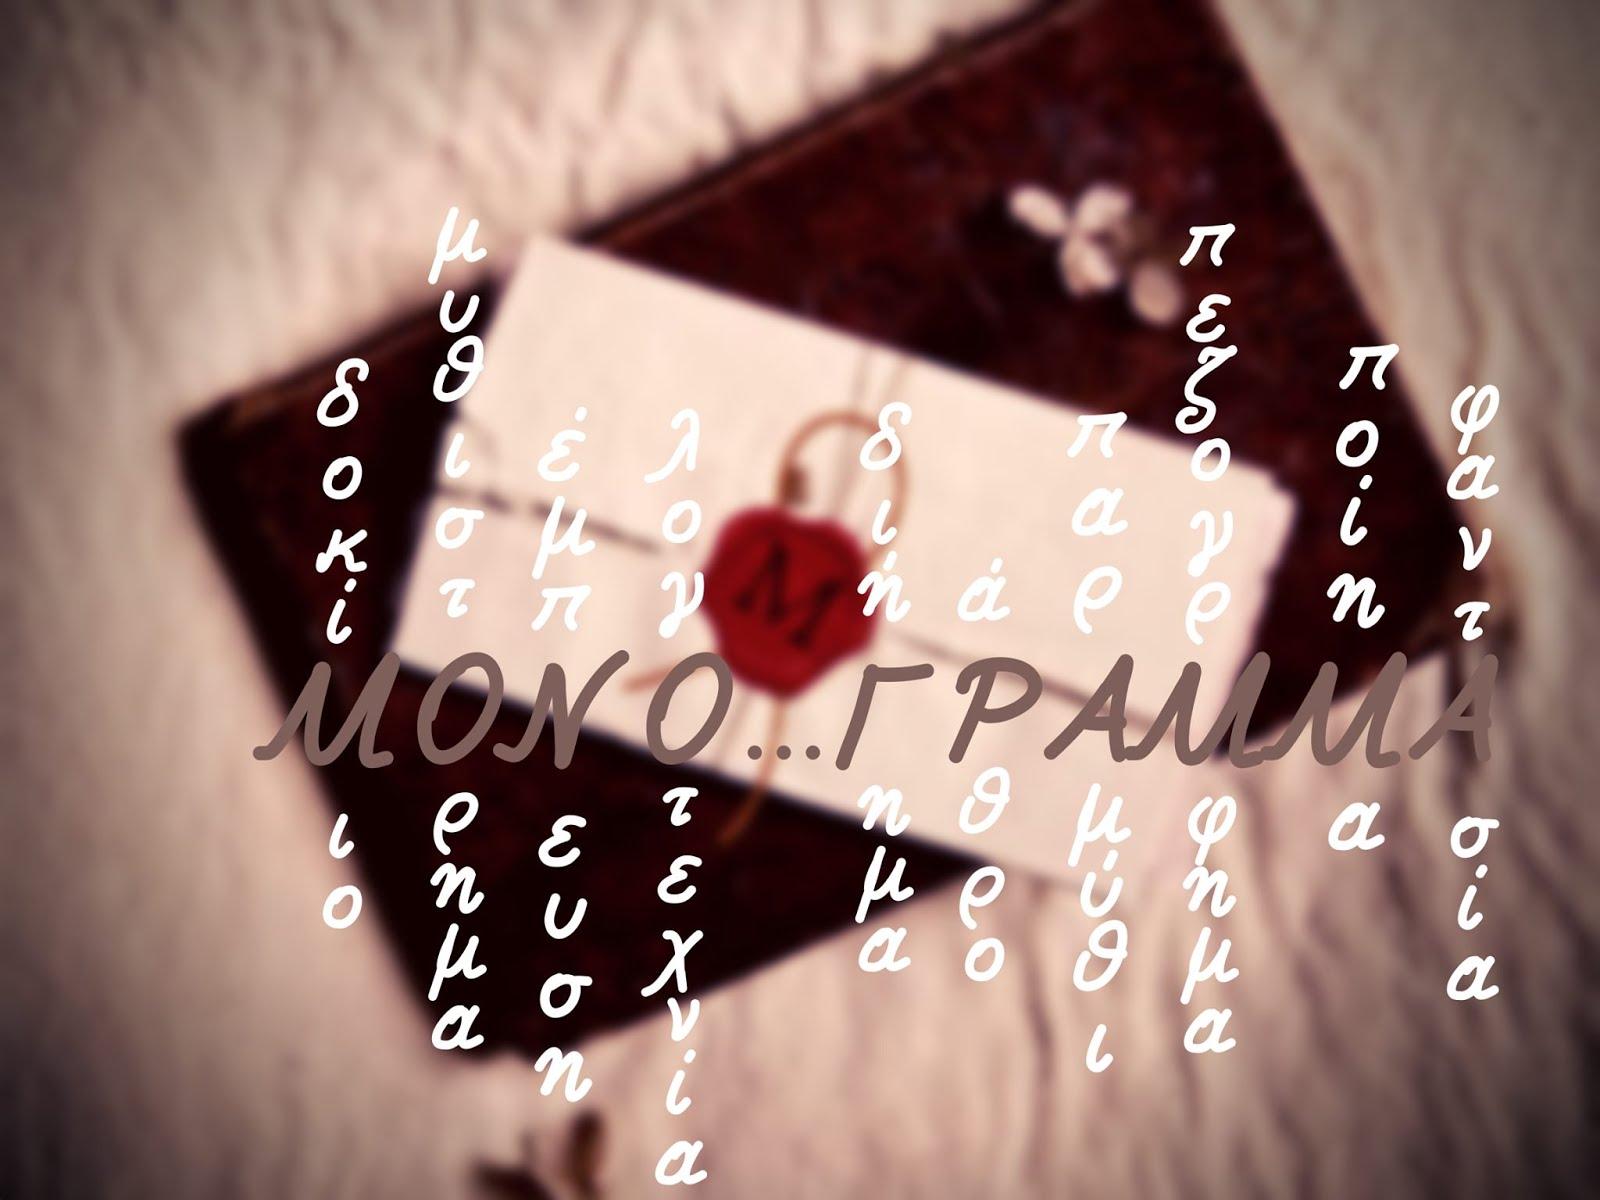 Mονο...γραμμα